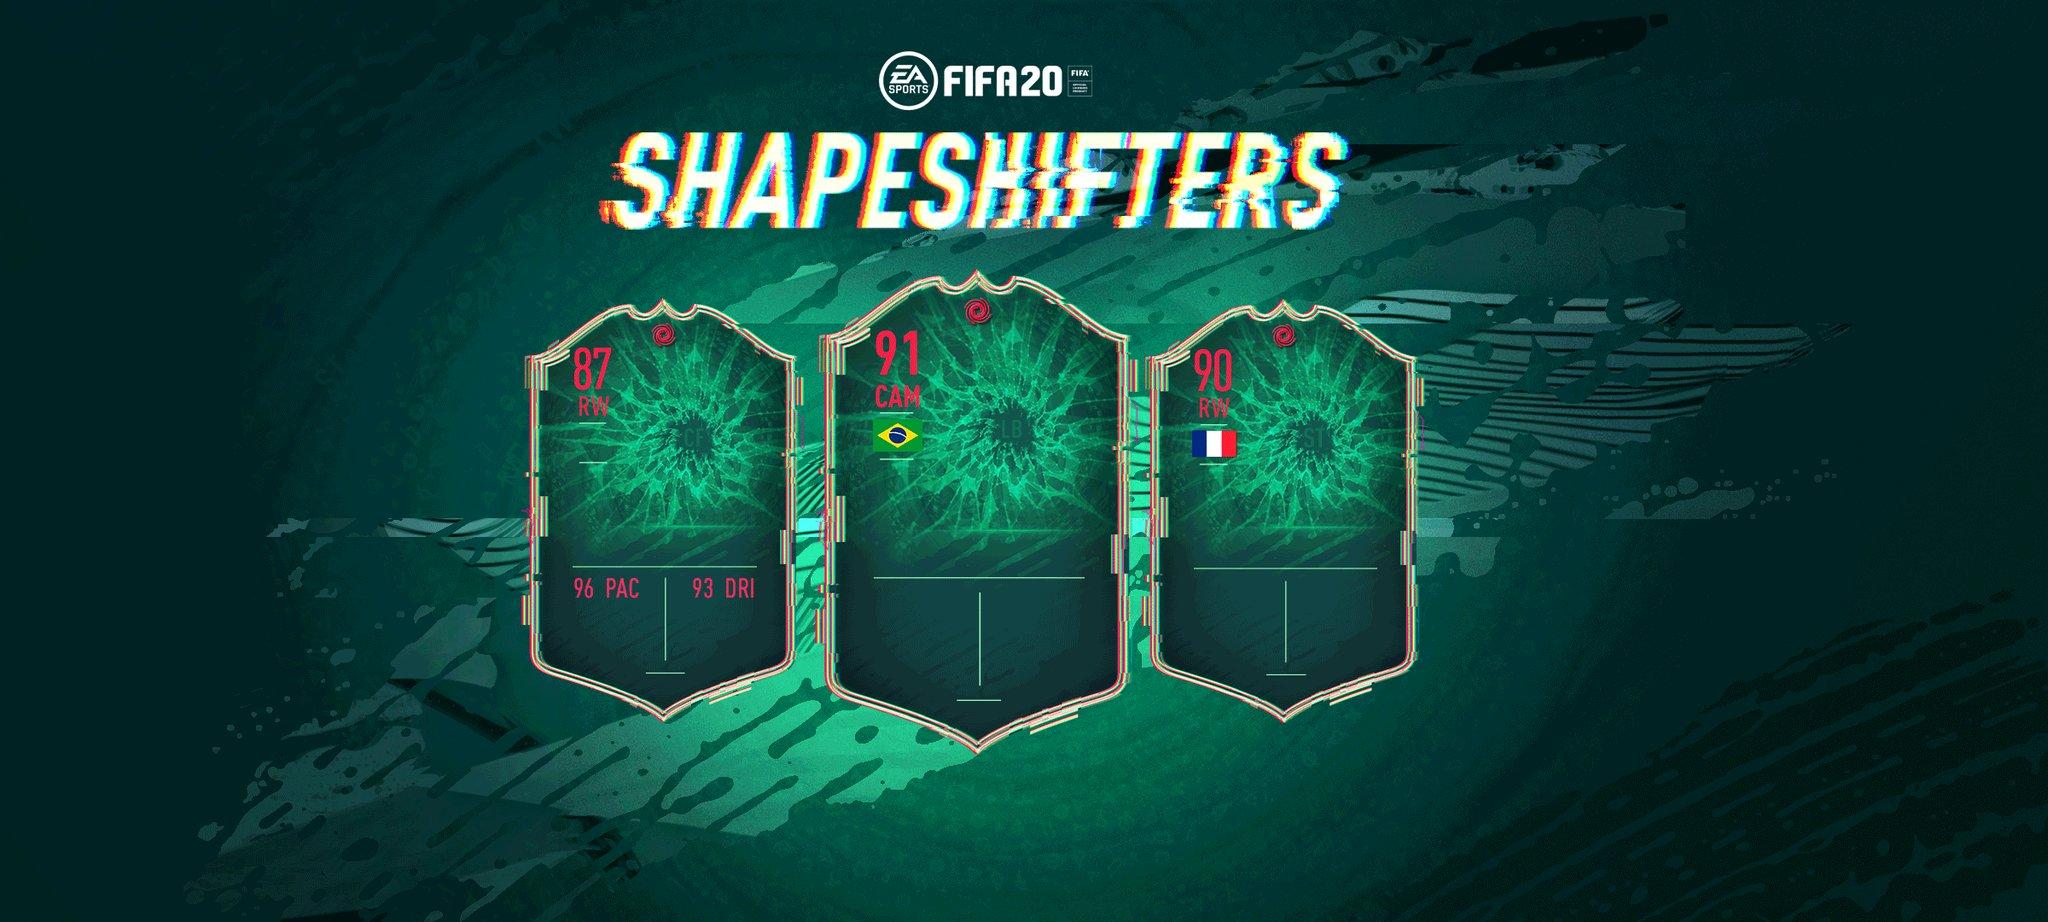 Shapeshifters sur FIFA 20 : le guide